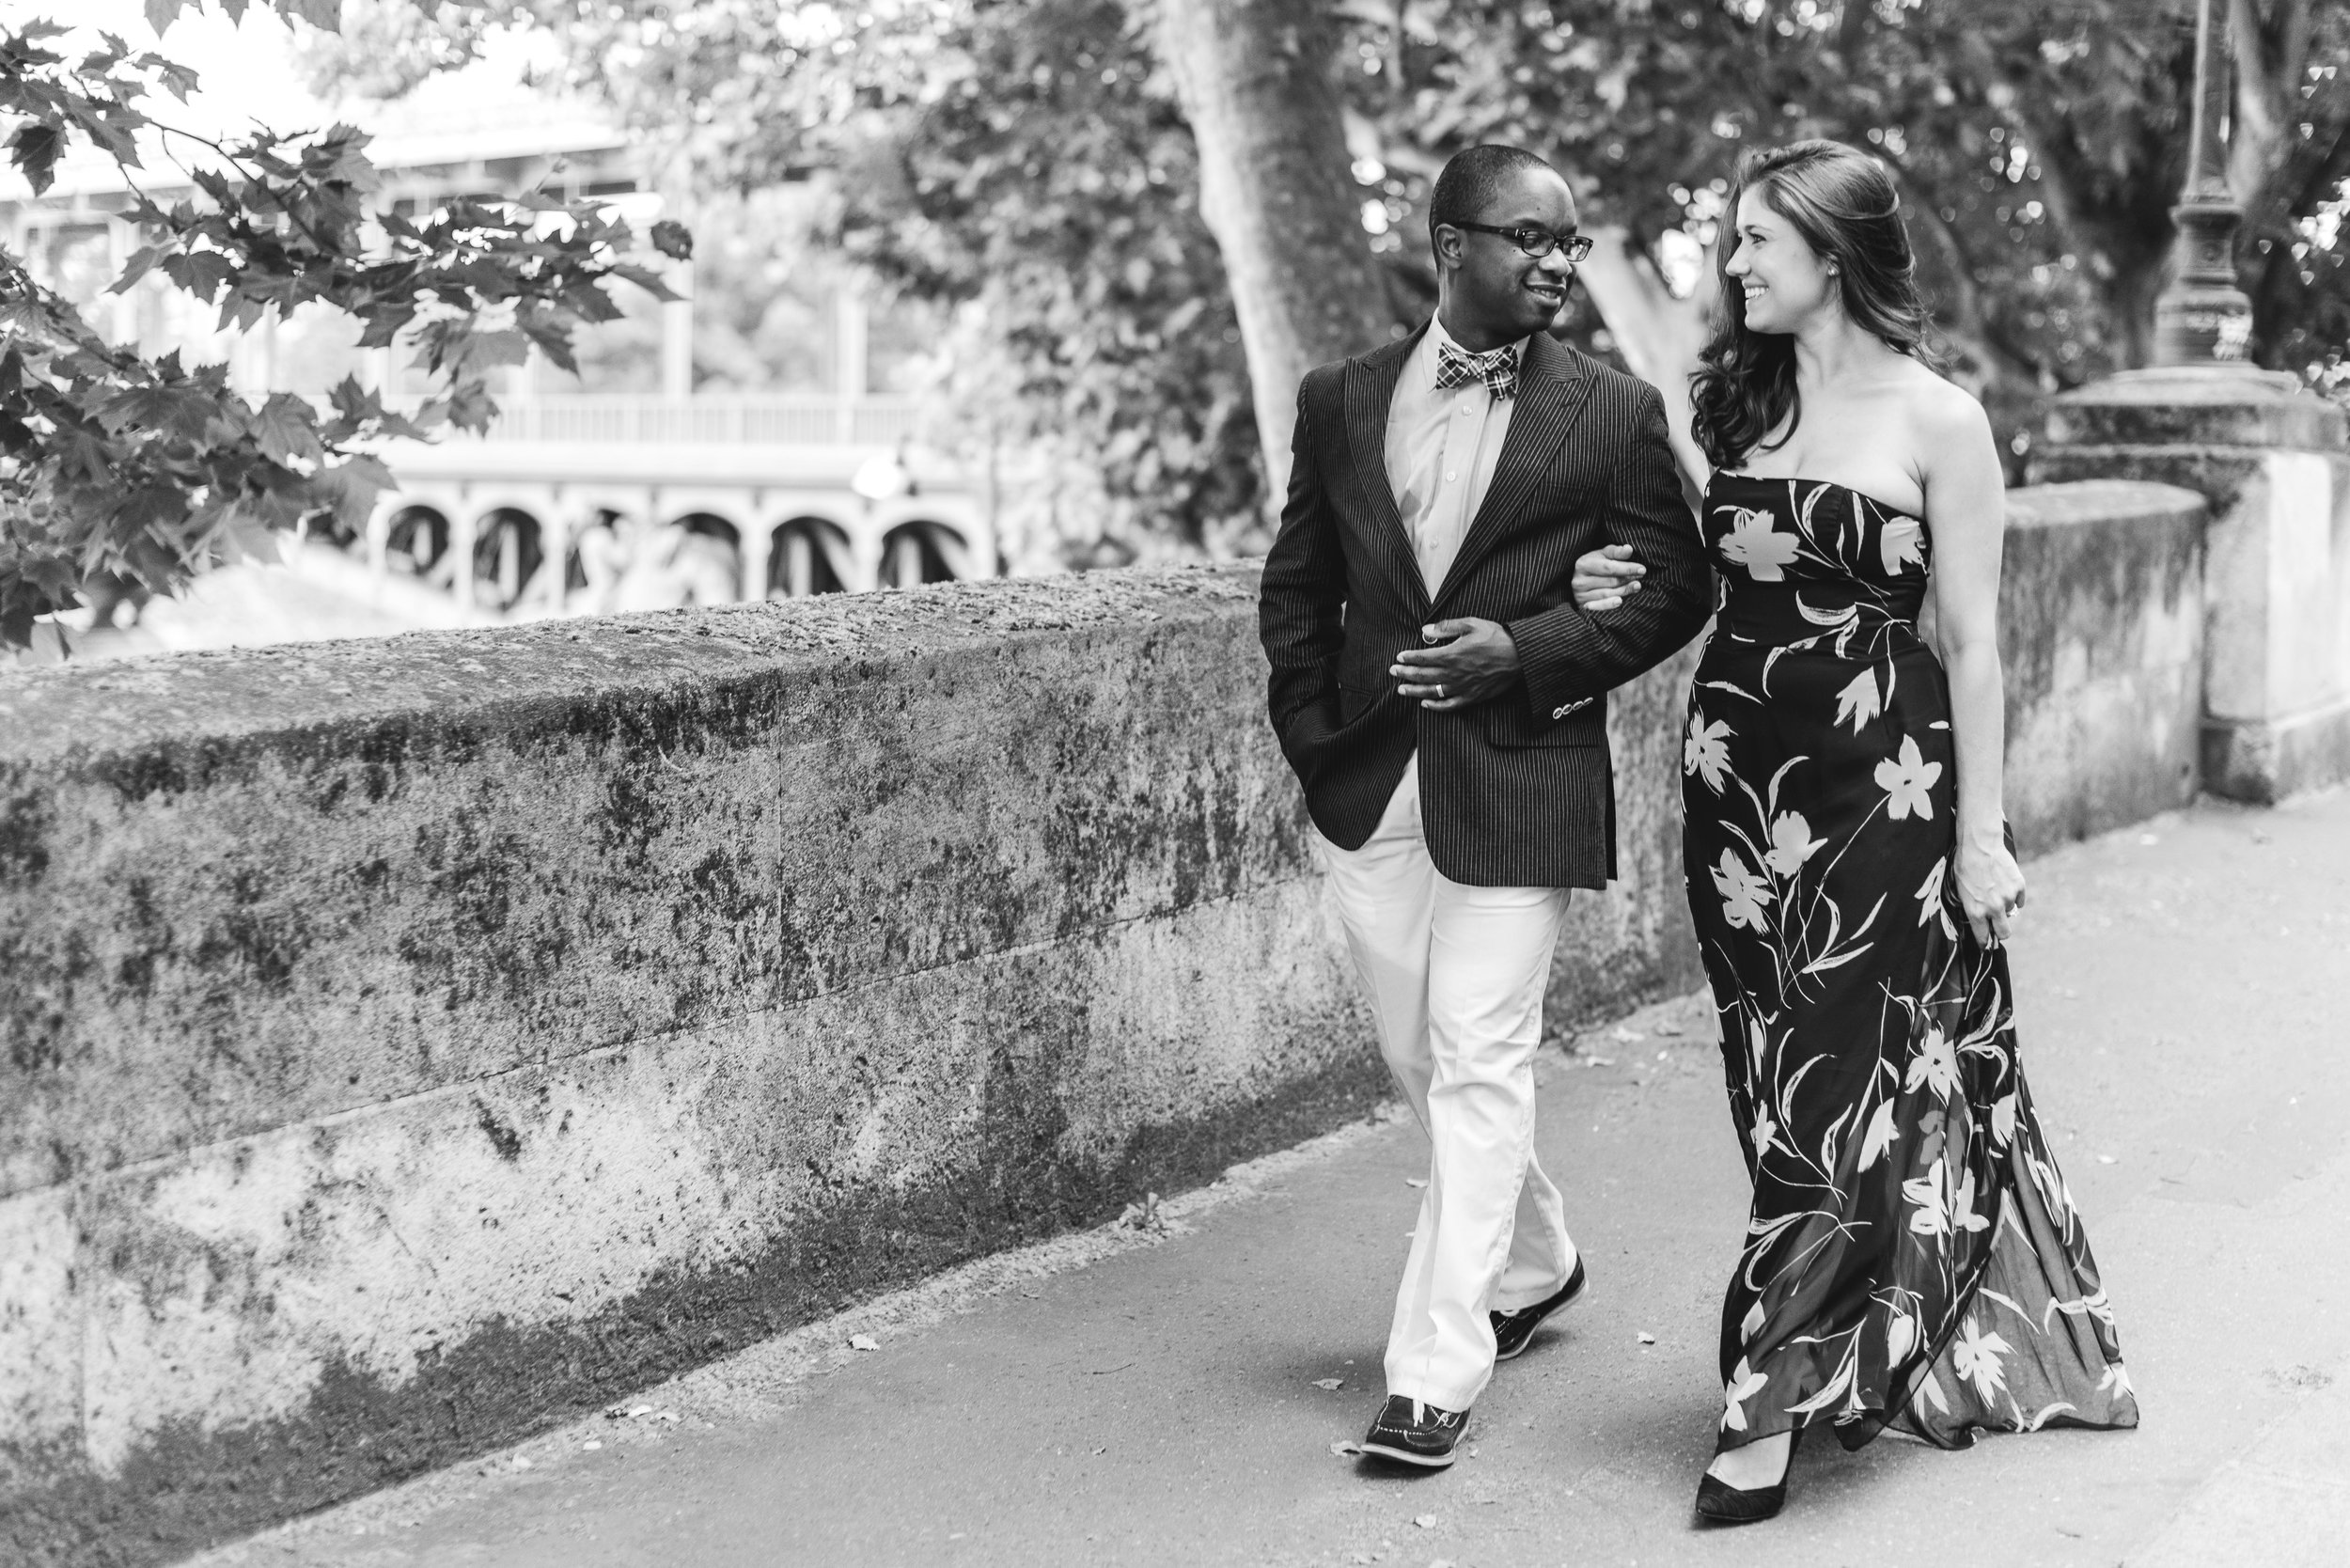 weddings by atelier photography-wedding-01-24.jpg